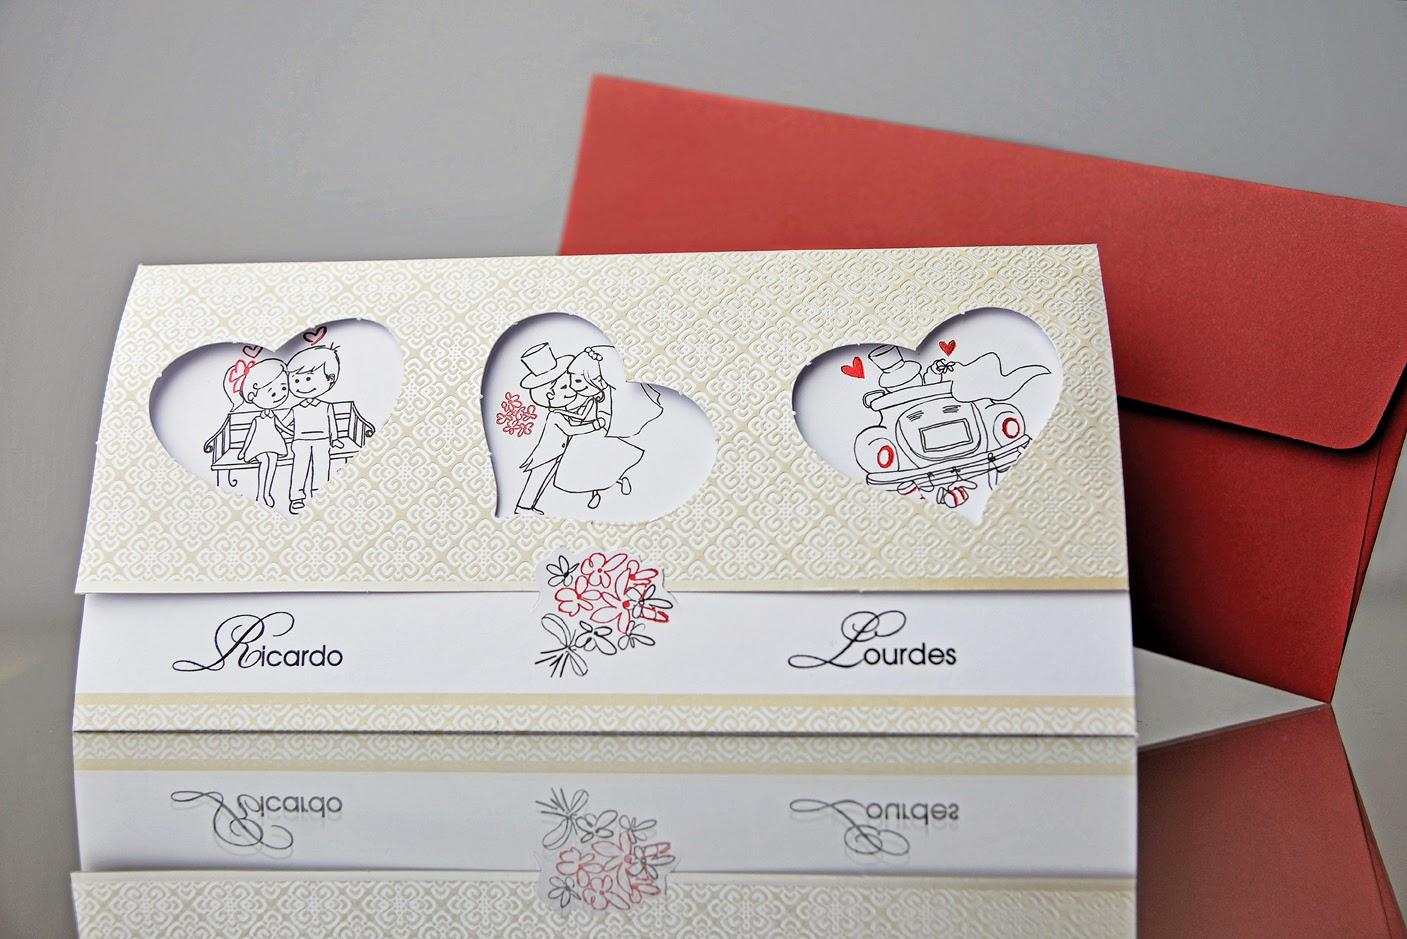 imagenes chistosas para matrimonio - Las Fotos Mas Graciosas e Insolitas de Bodas Miralas